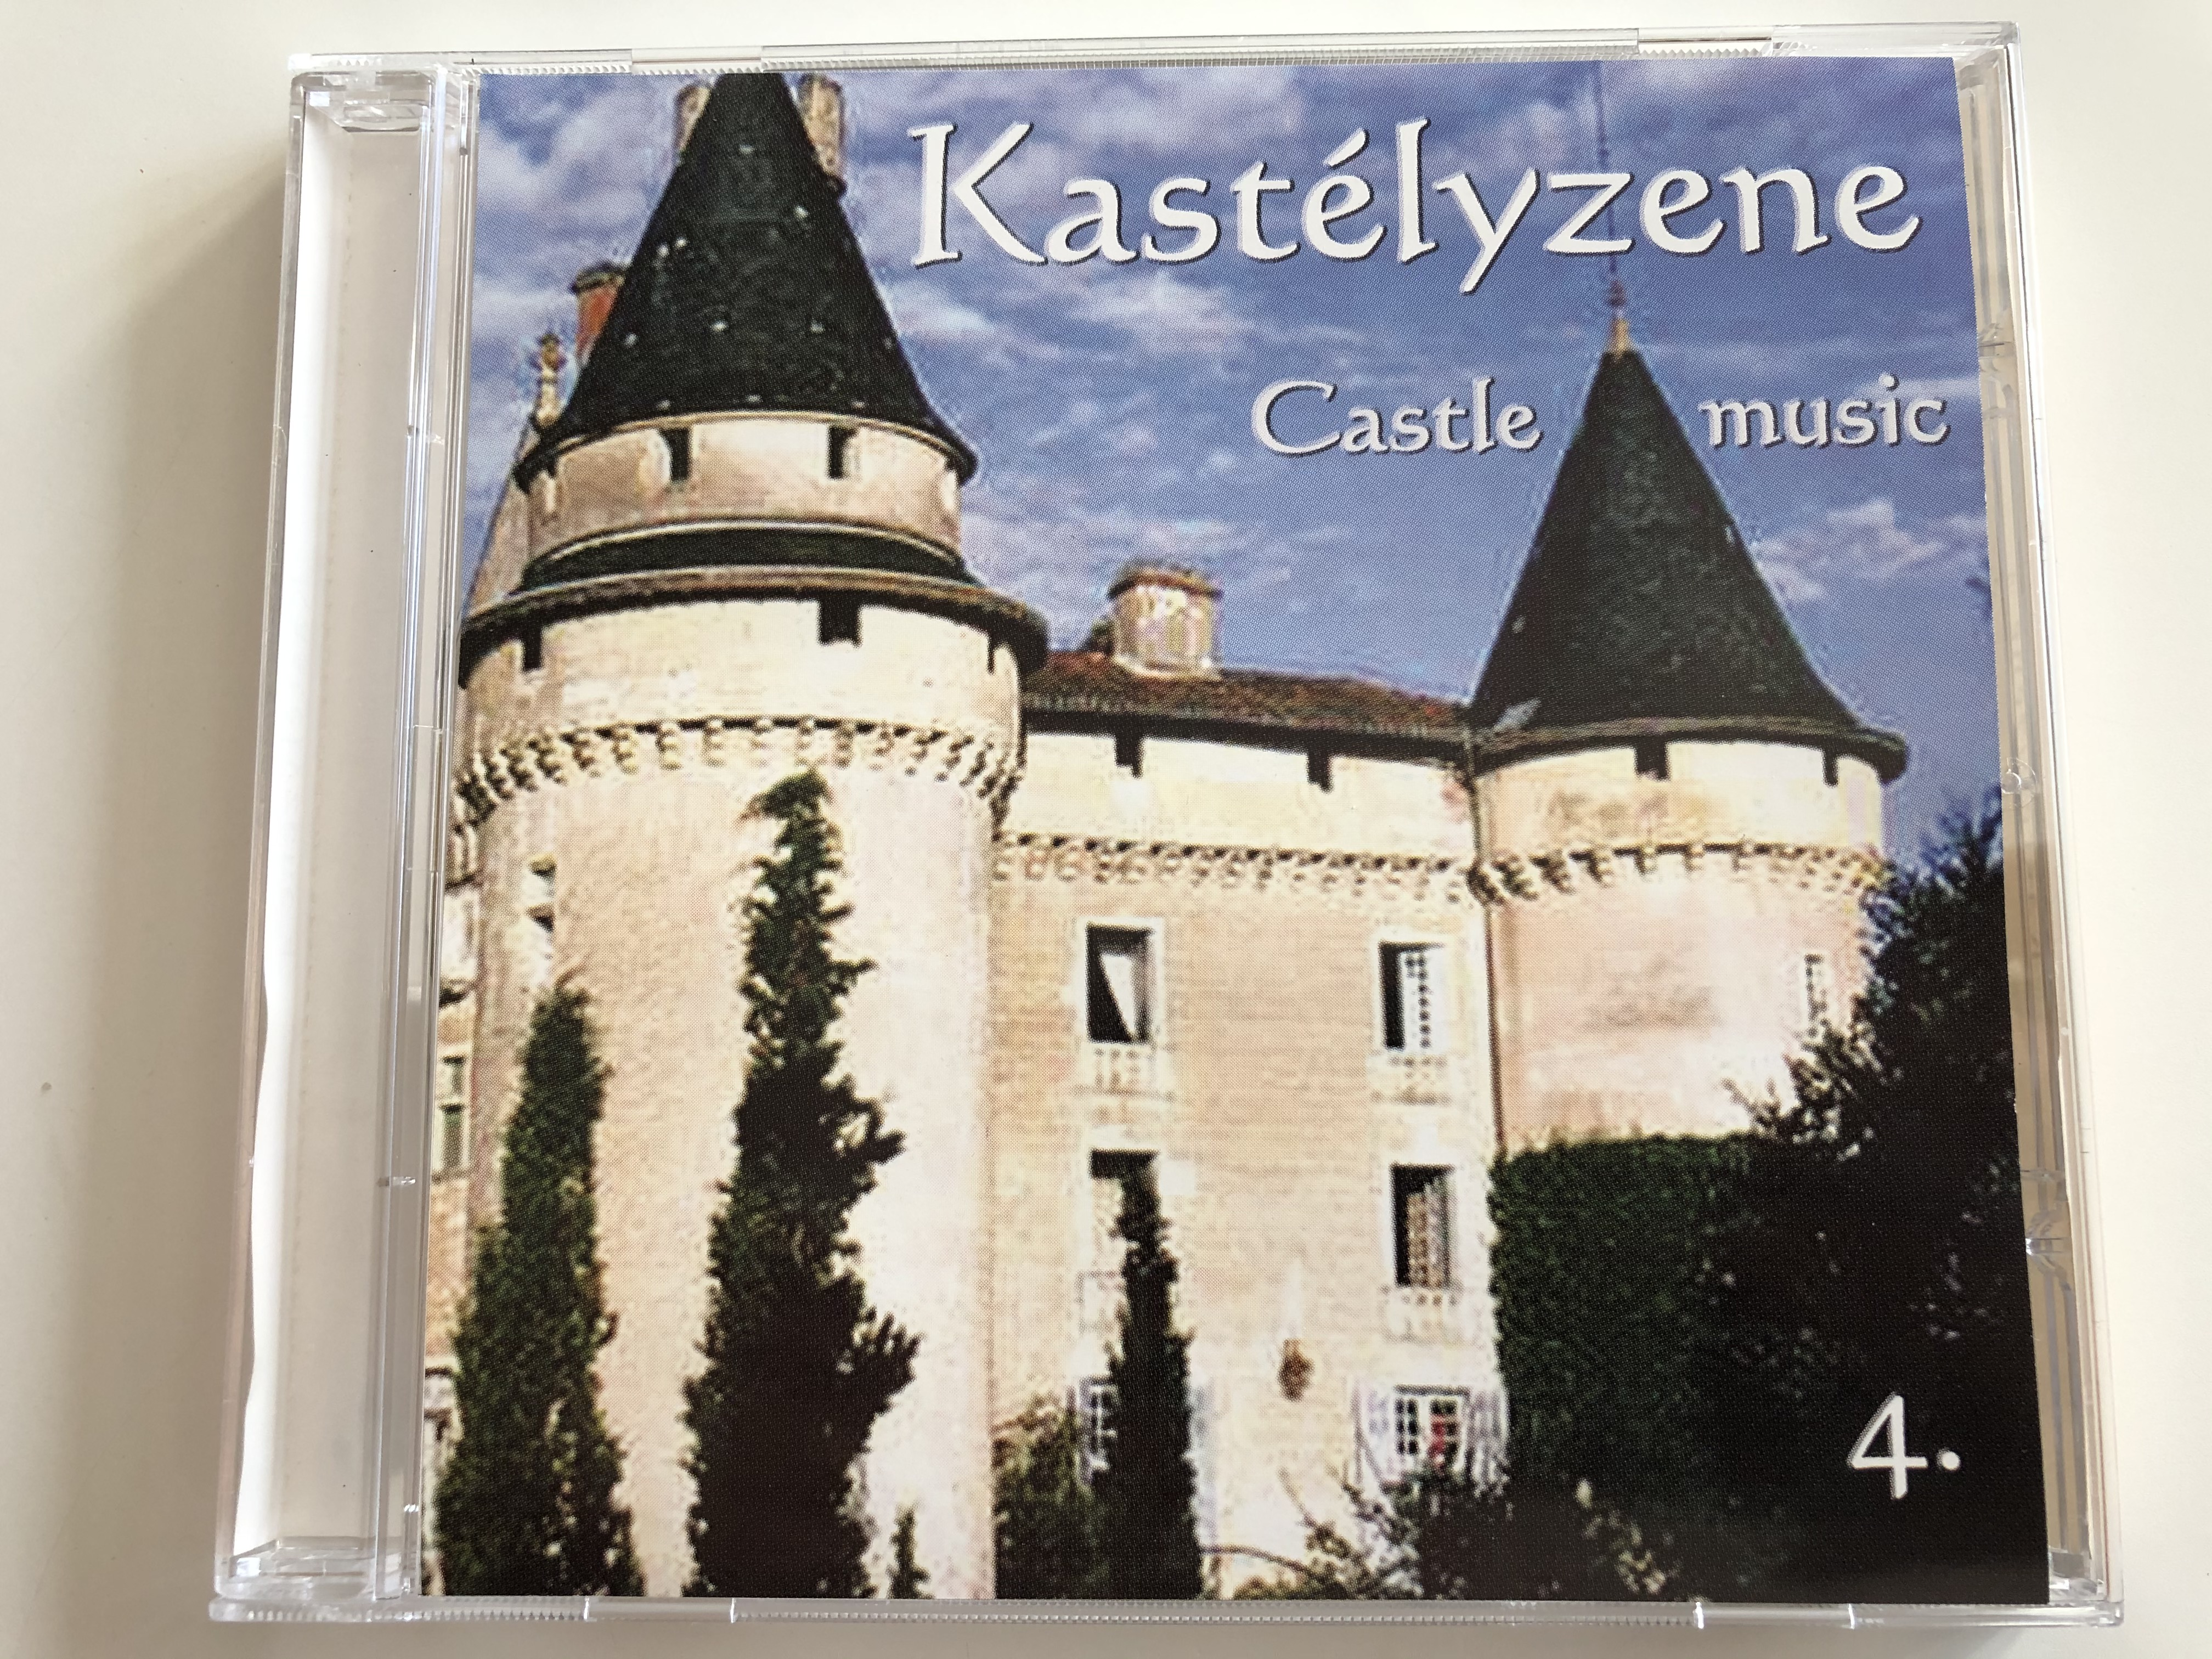 katelyzene-castle-music-4.-dalnok-kiado-audio-cd-5999536950260-1-.jpg